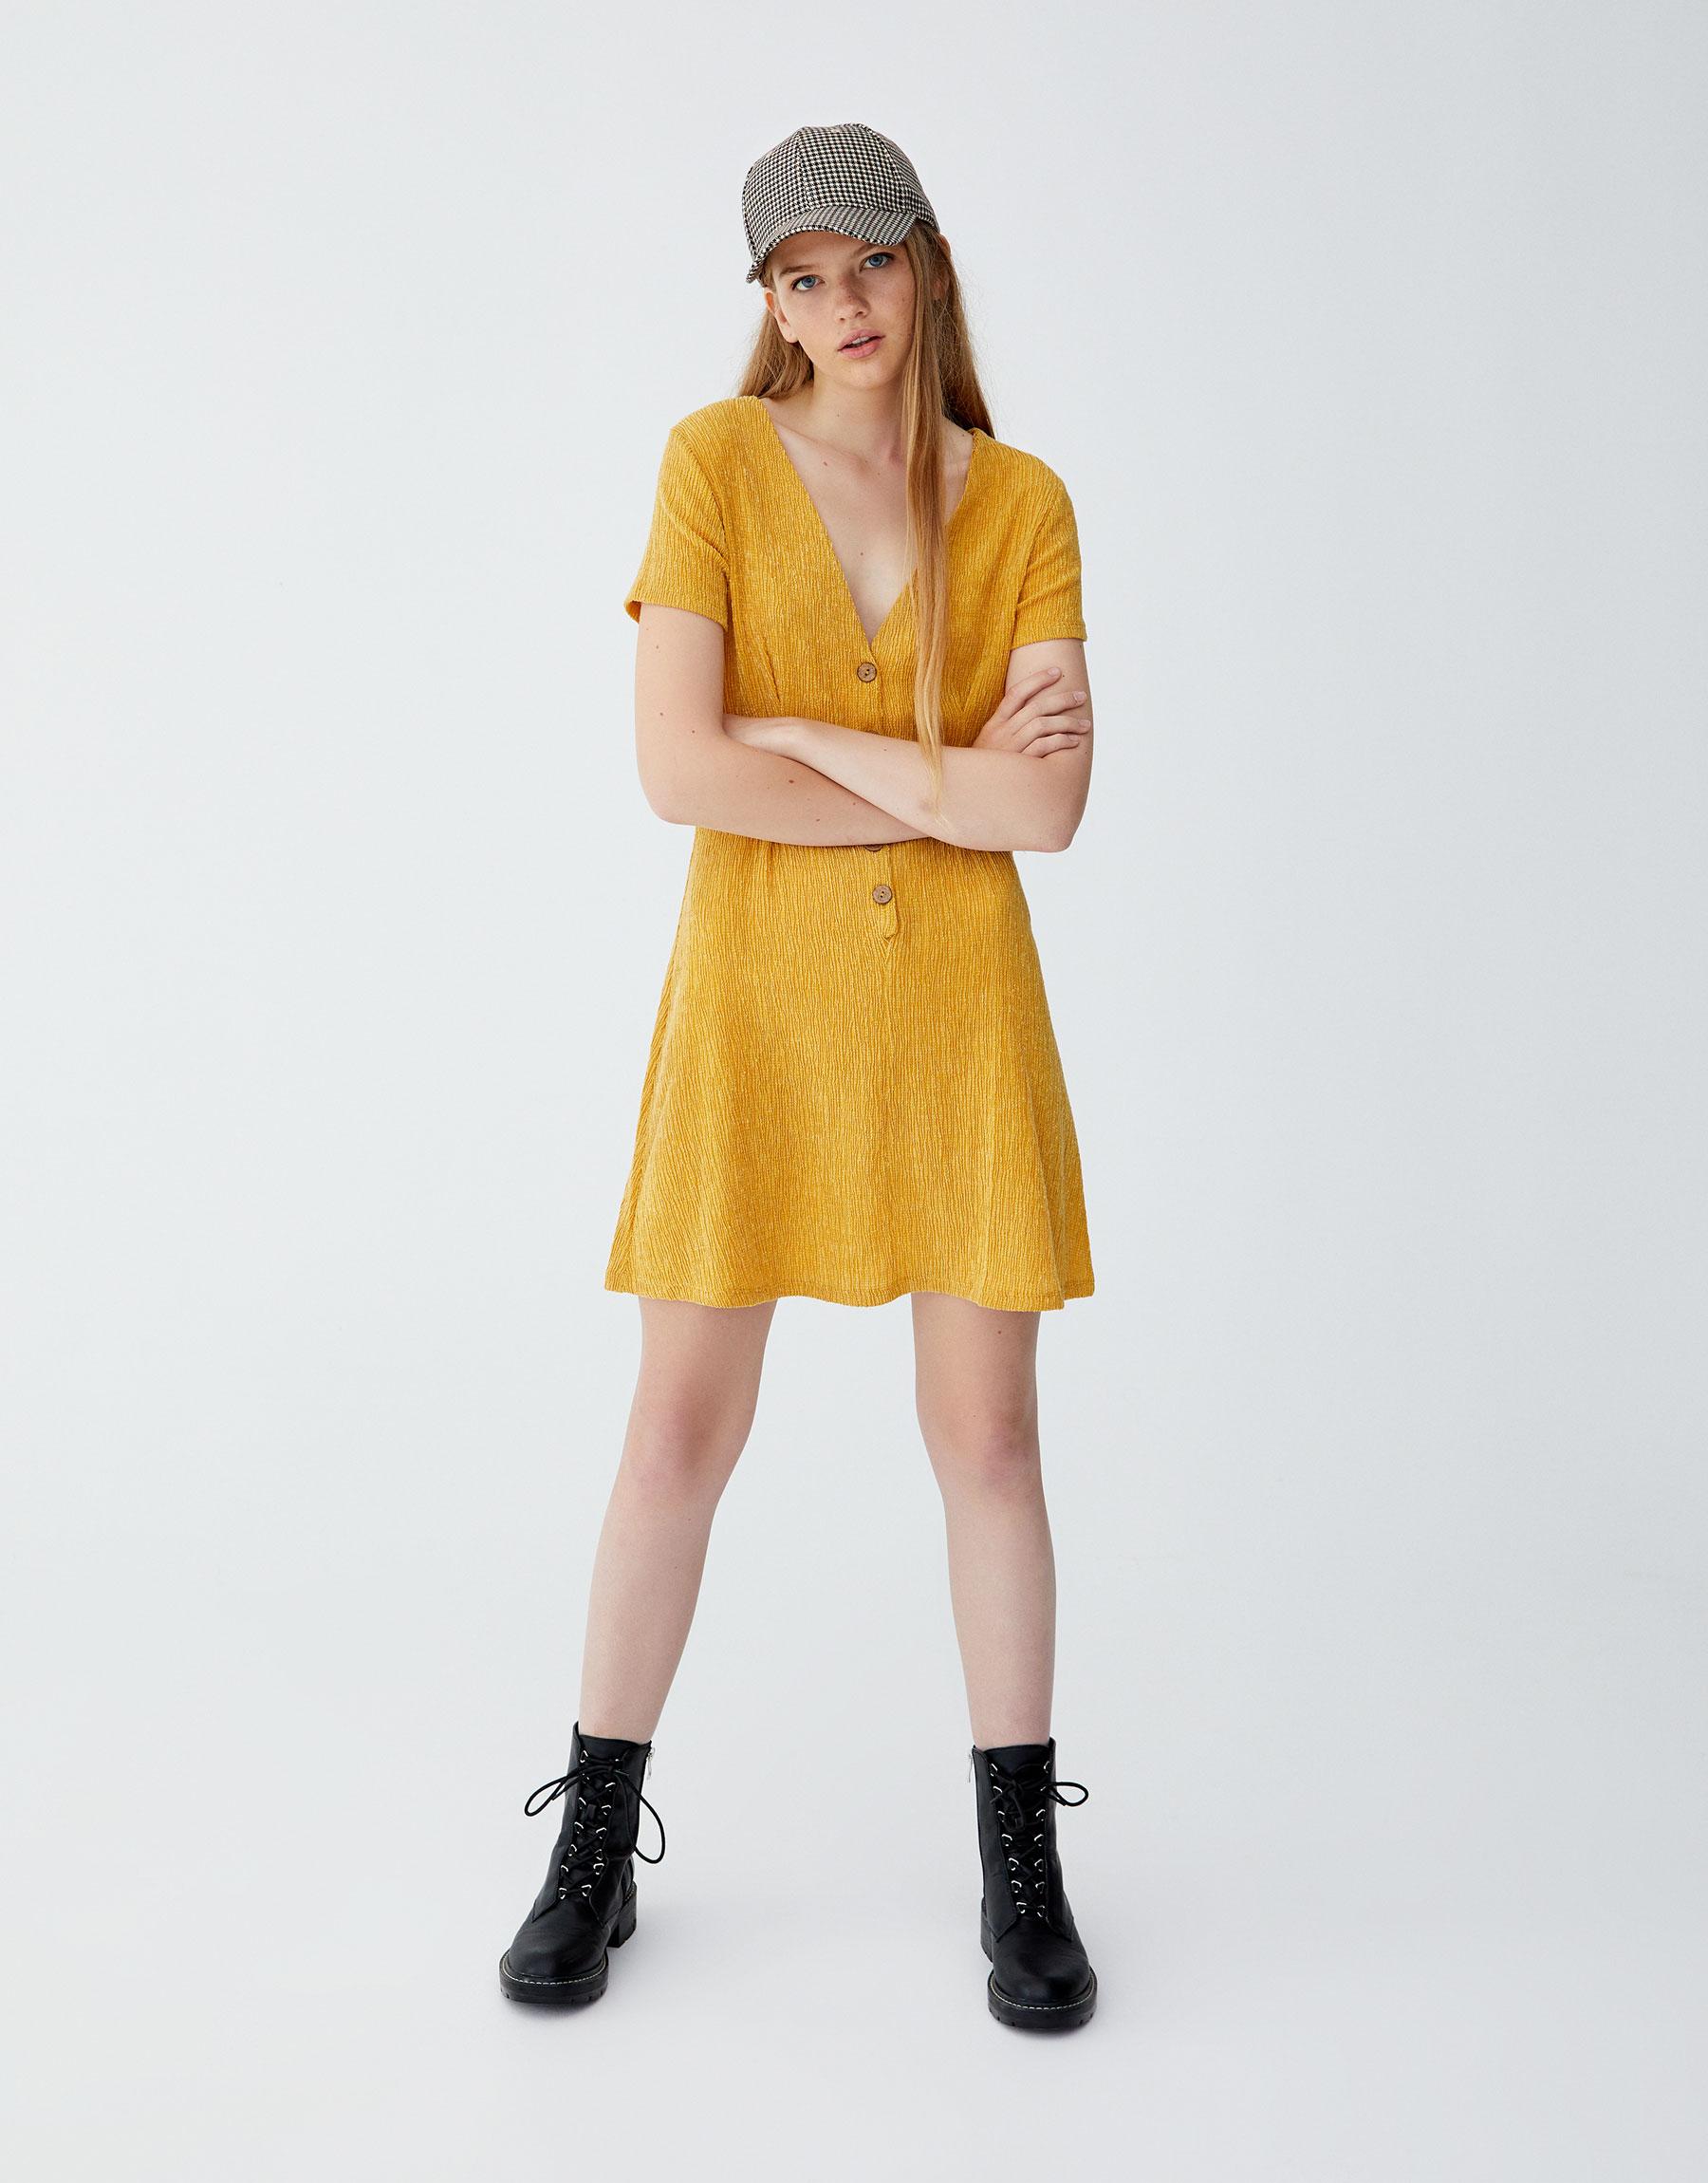 77857d77b3e Μίντι φόρεμα με πλαϊνό σχίσιμο με κουμπιά - PULL&BEAR